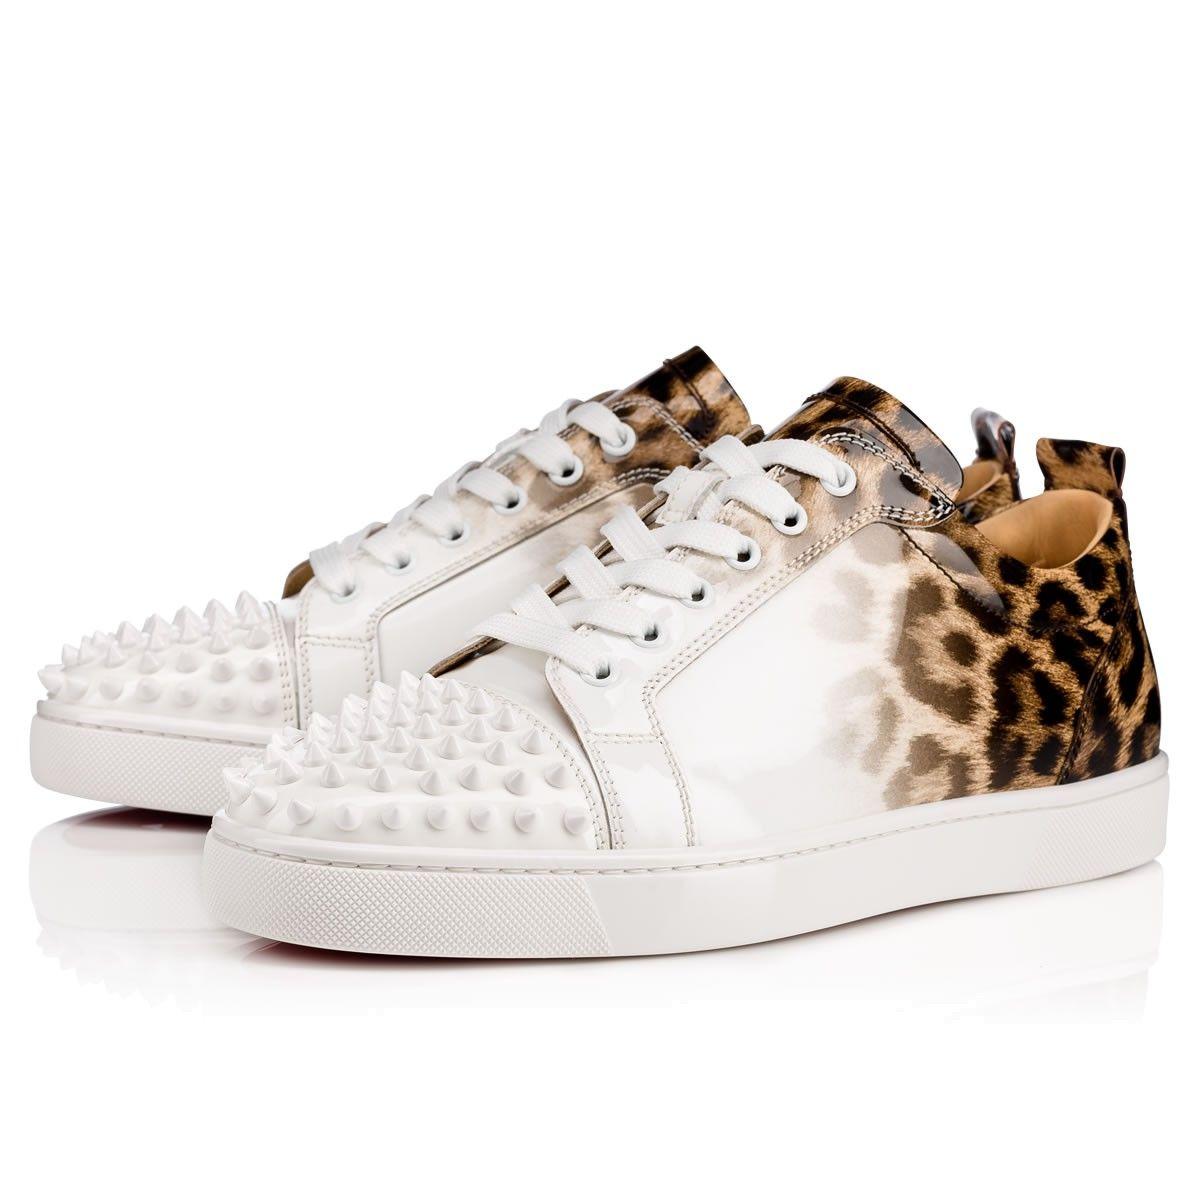 00ae25f63388 Louis Junior Spikes Men s Flat Shadow Sv Suede - Men Shoes ...